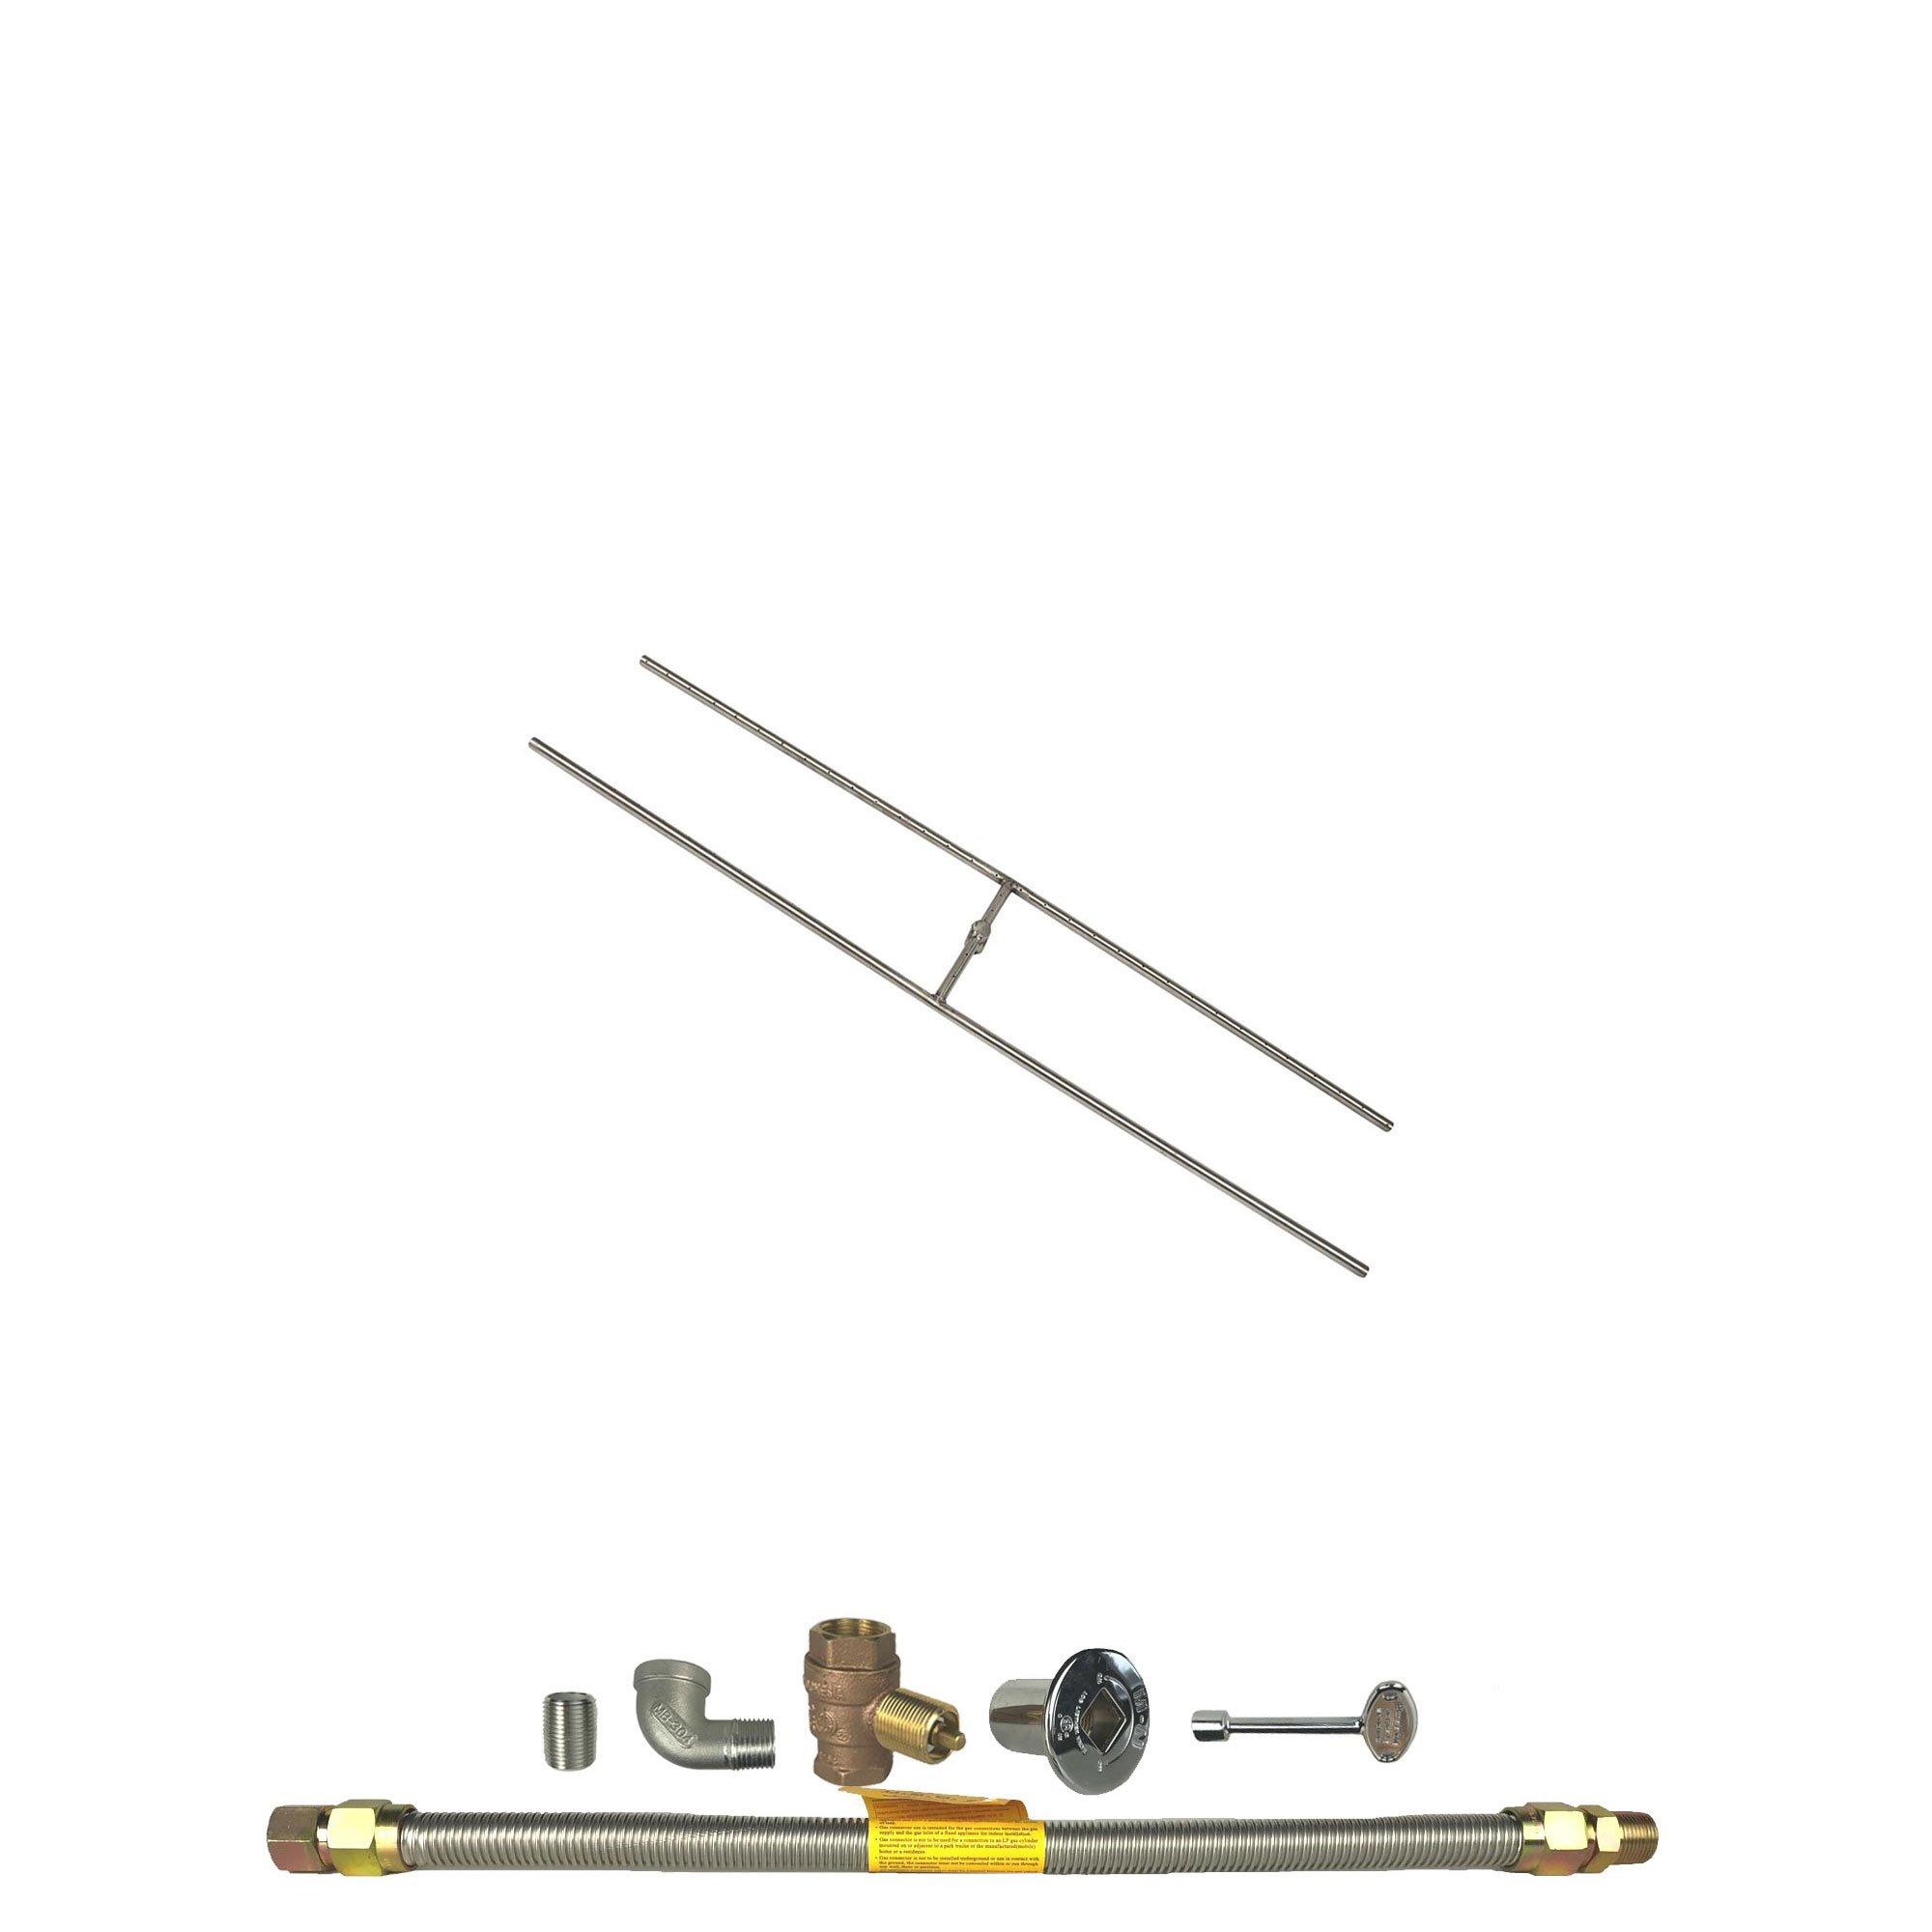 Spotix HPC Rectangle H-Burner Fire Pit Burner Kit (FPS-HBSB36KIT-NG-MSCB), 36x8-Inch Burner, Match Light, Natural Gas by Spotix